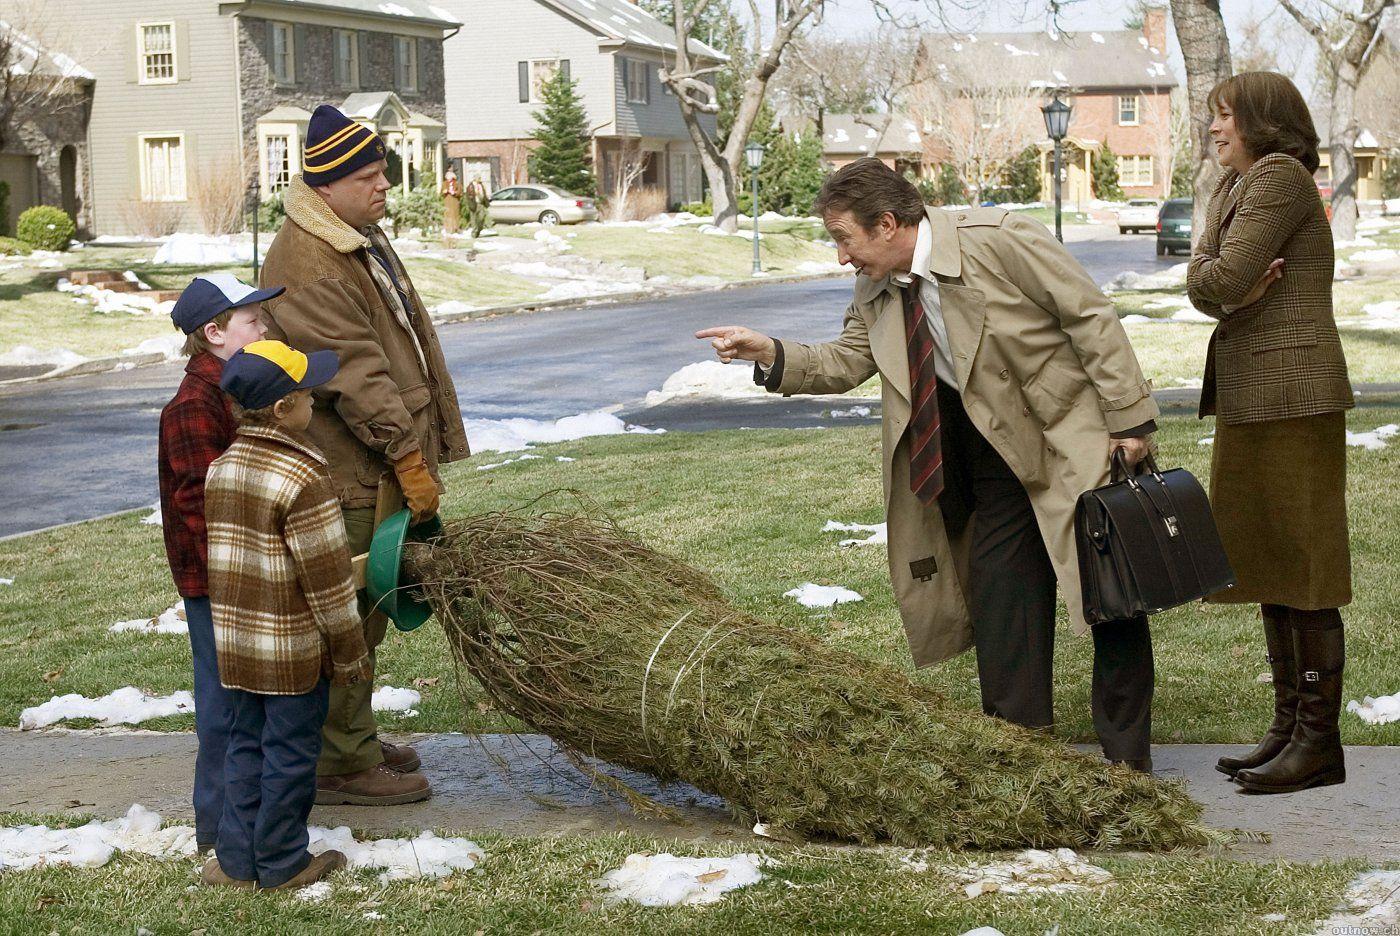 Christmas with the Kranks (2004)   Film-Szenenbild   Christmas with the kranks, Best christmas ...